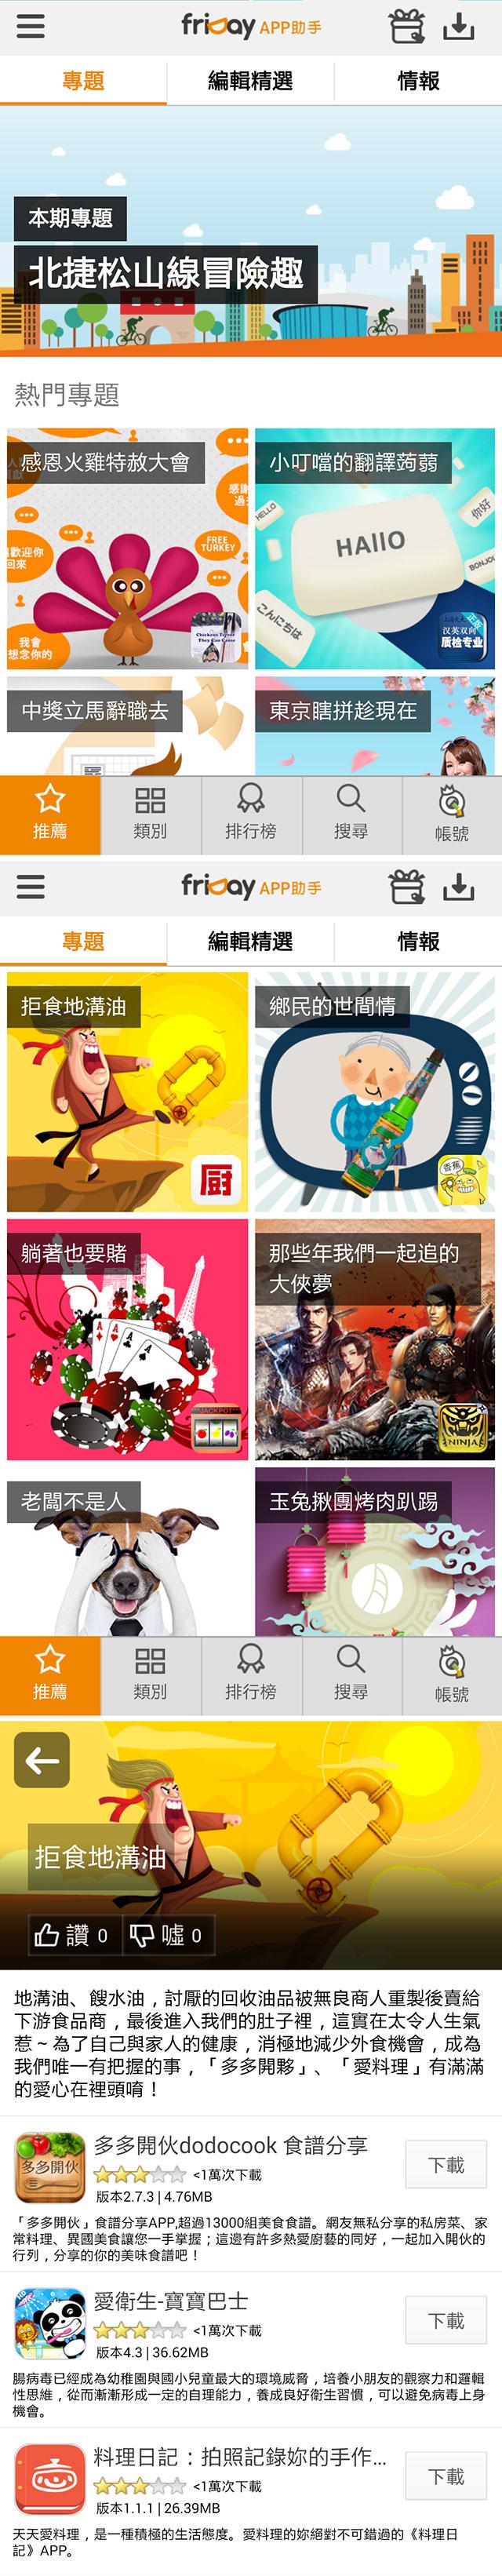 friDayAPP助手 APP GooglePlay 商店 達人推薦 娛樂中心 遊戲 手機優化 Qbon 影視 娛樂 美食 旅遊 生活 購物 人2 人2的插画星球 People2 instagram people2planet